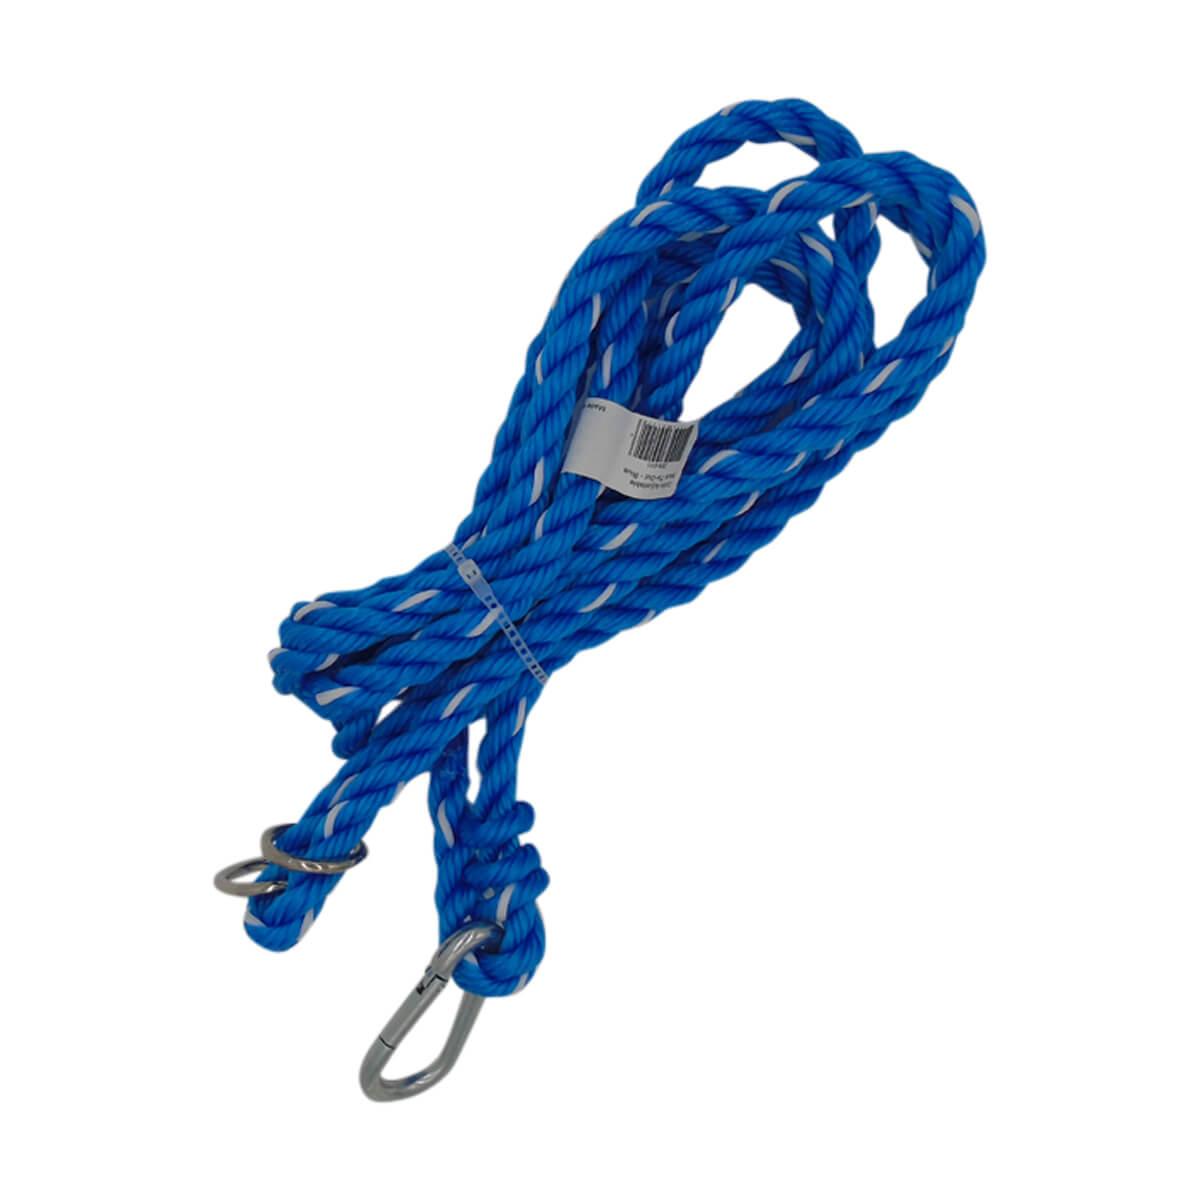 Adjustable Rope Halter Tie-Out - Blue